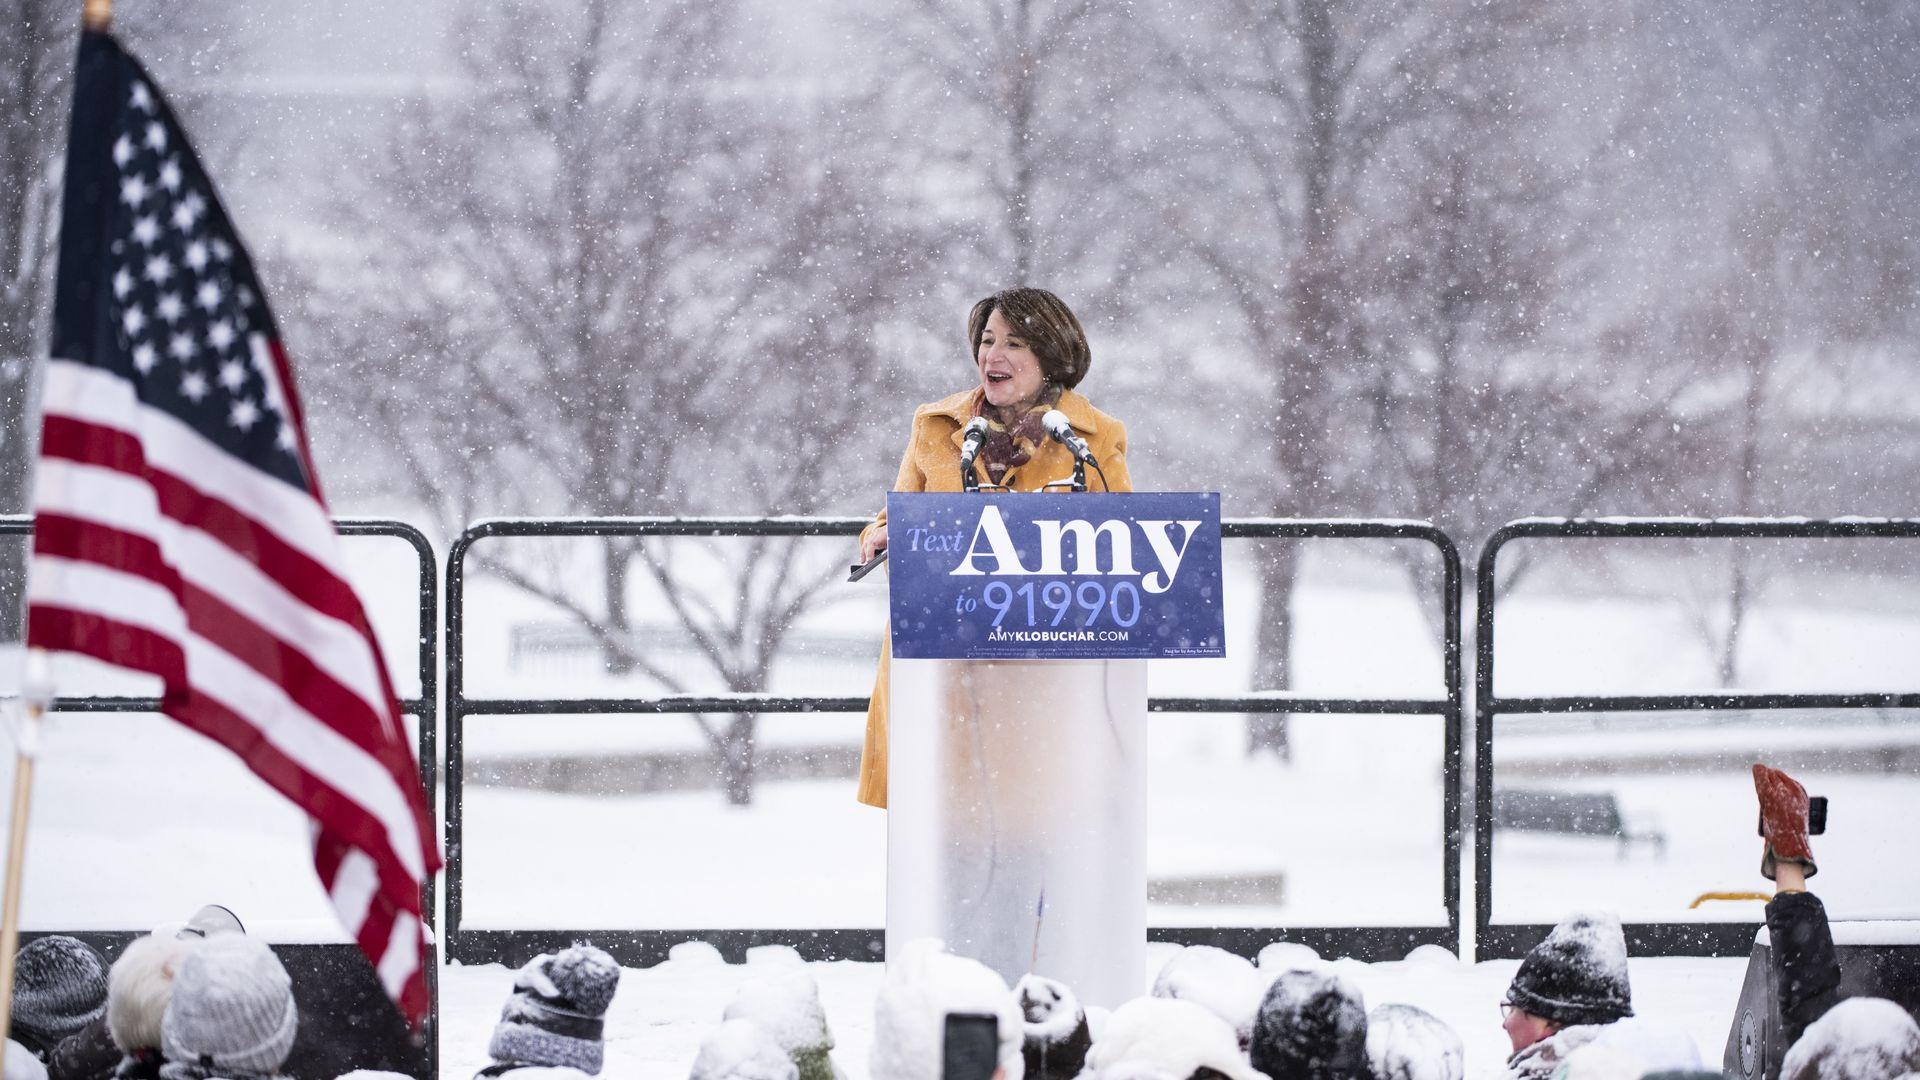 Amy Klobuchar announces her presidential bid